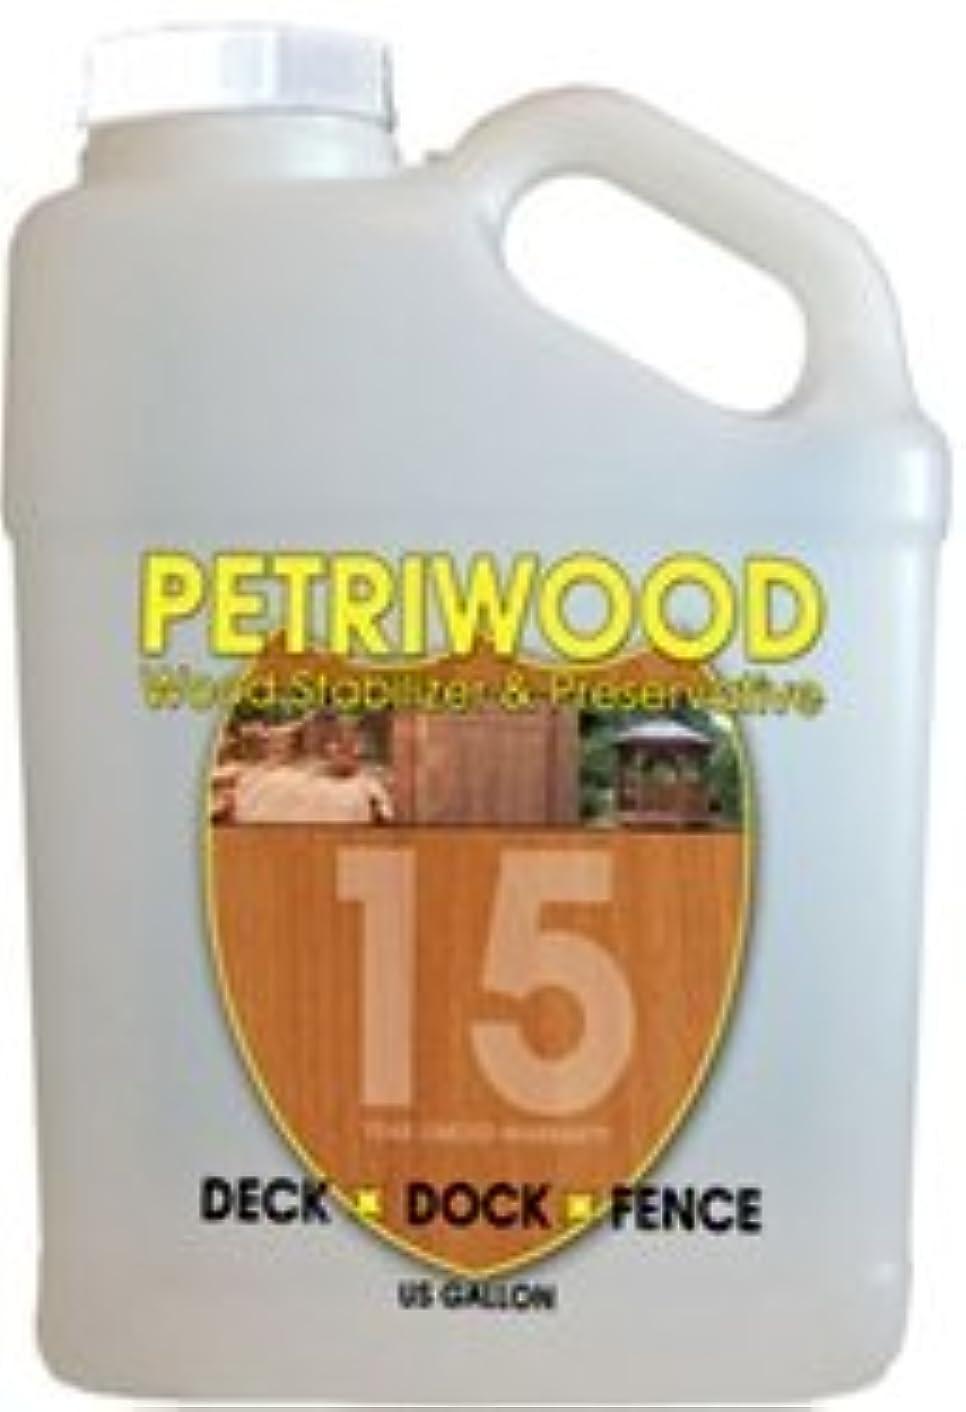 Petri-Wood Concrete Pentrant & Wood Sealer